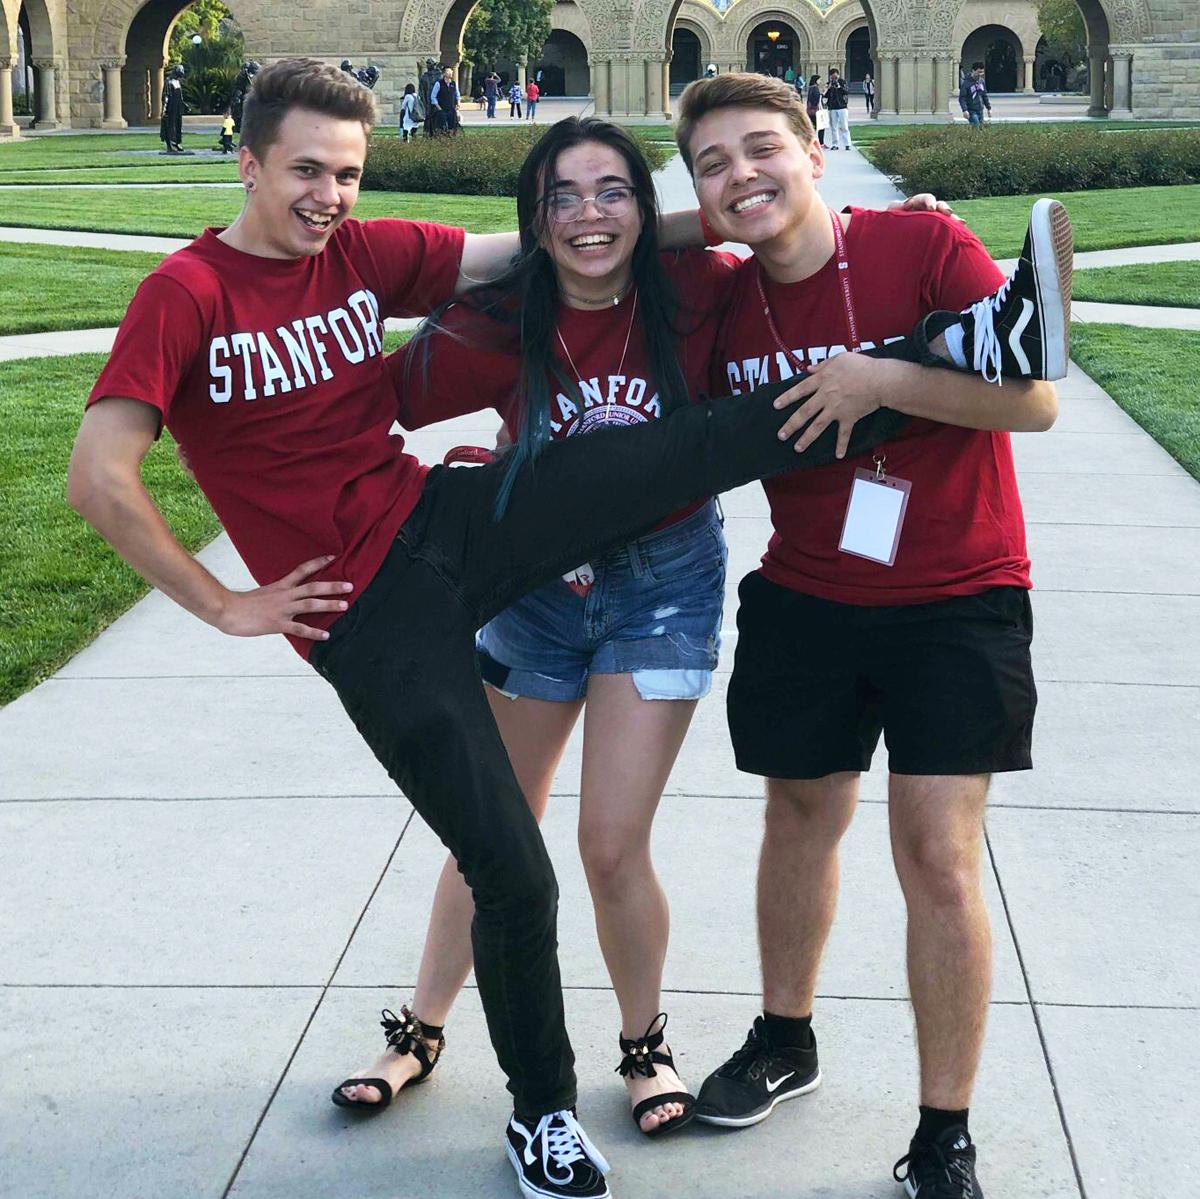 Jade Tristen and Antonio R at Stanford